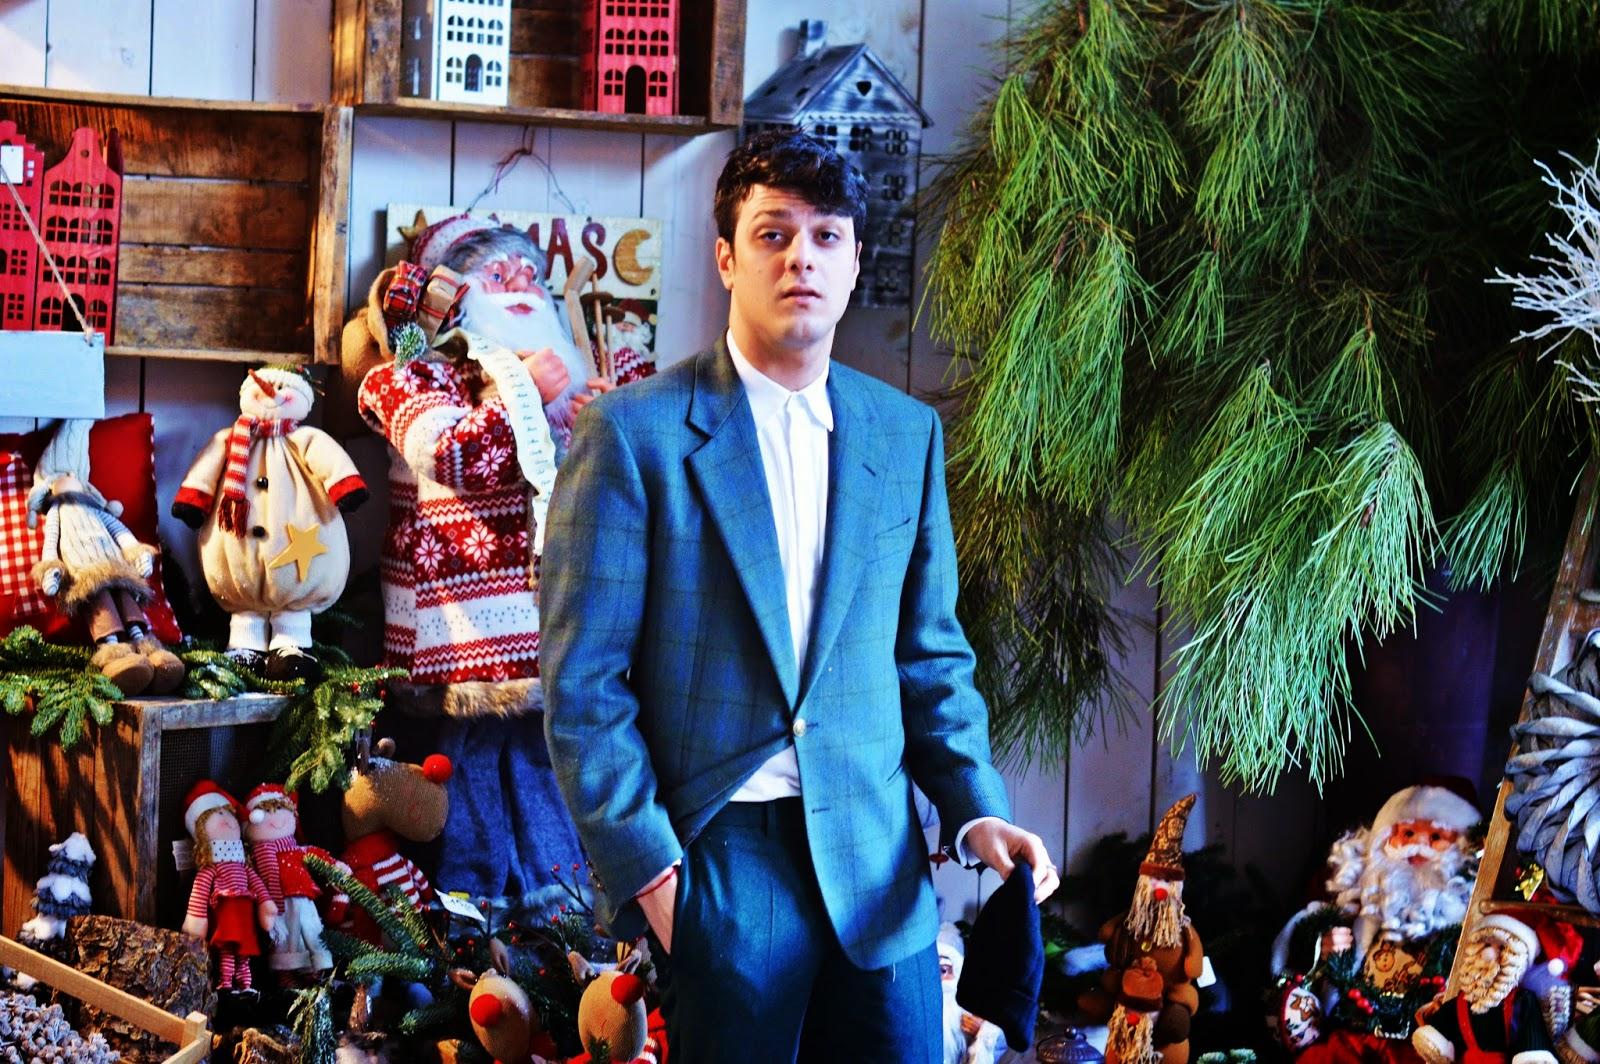 Christmas, outfit, hipsteriaproject, elisataviti, elisa taviti, dario fattore, fashion blogger, wishlist, natale, christmas, santa claus